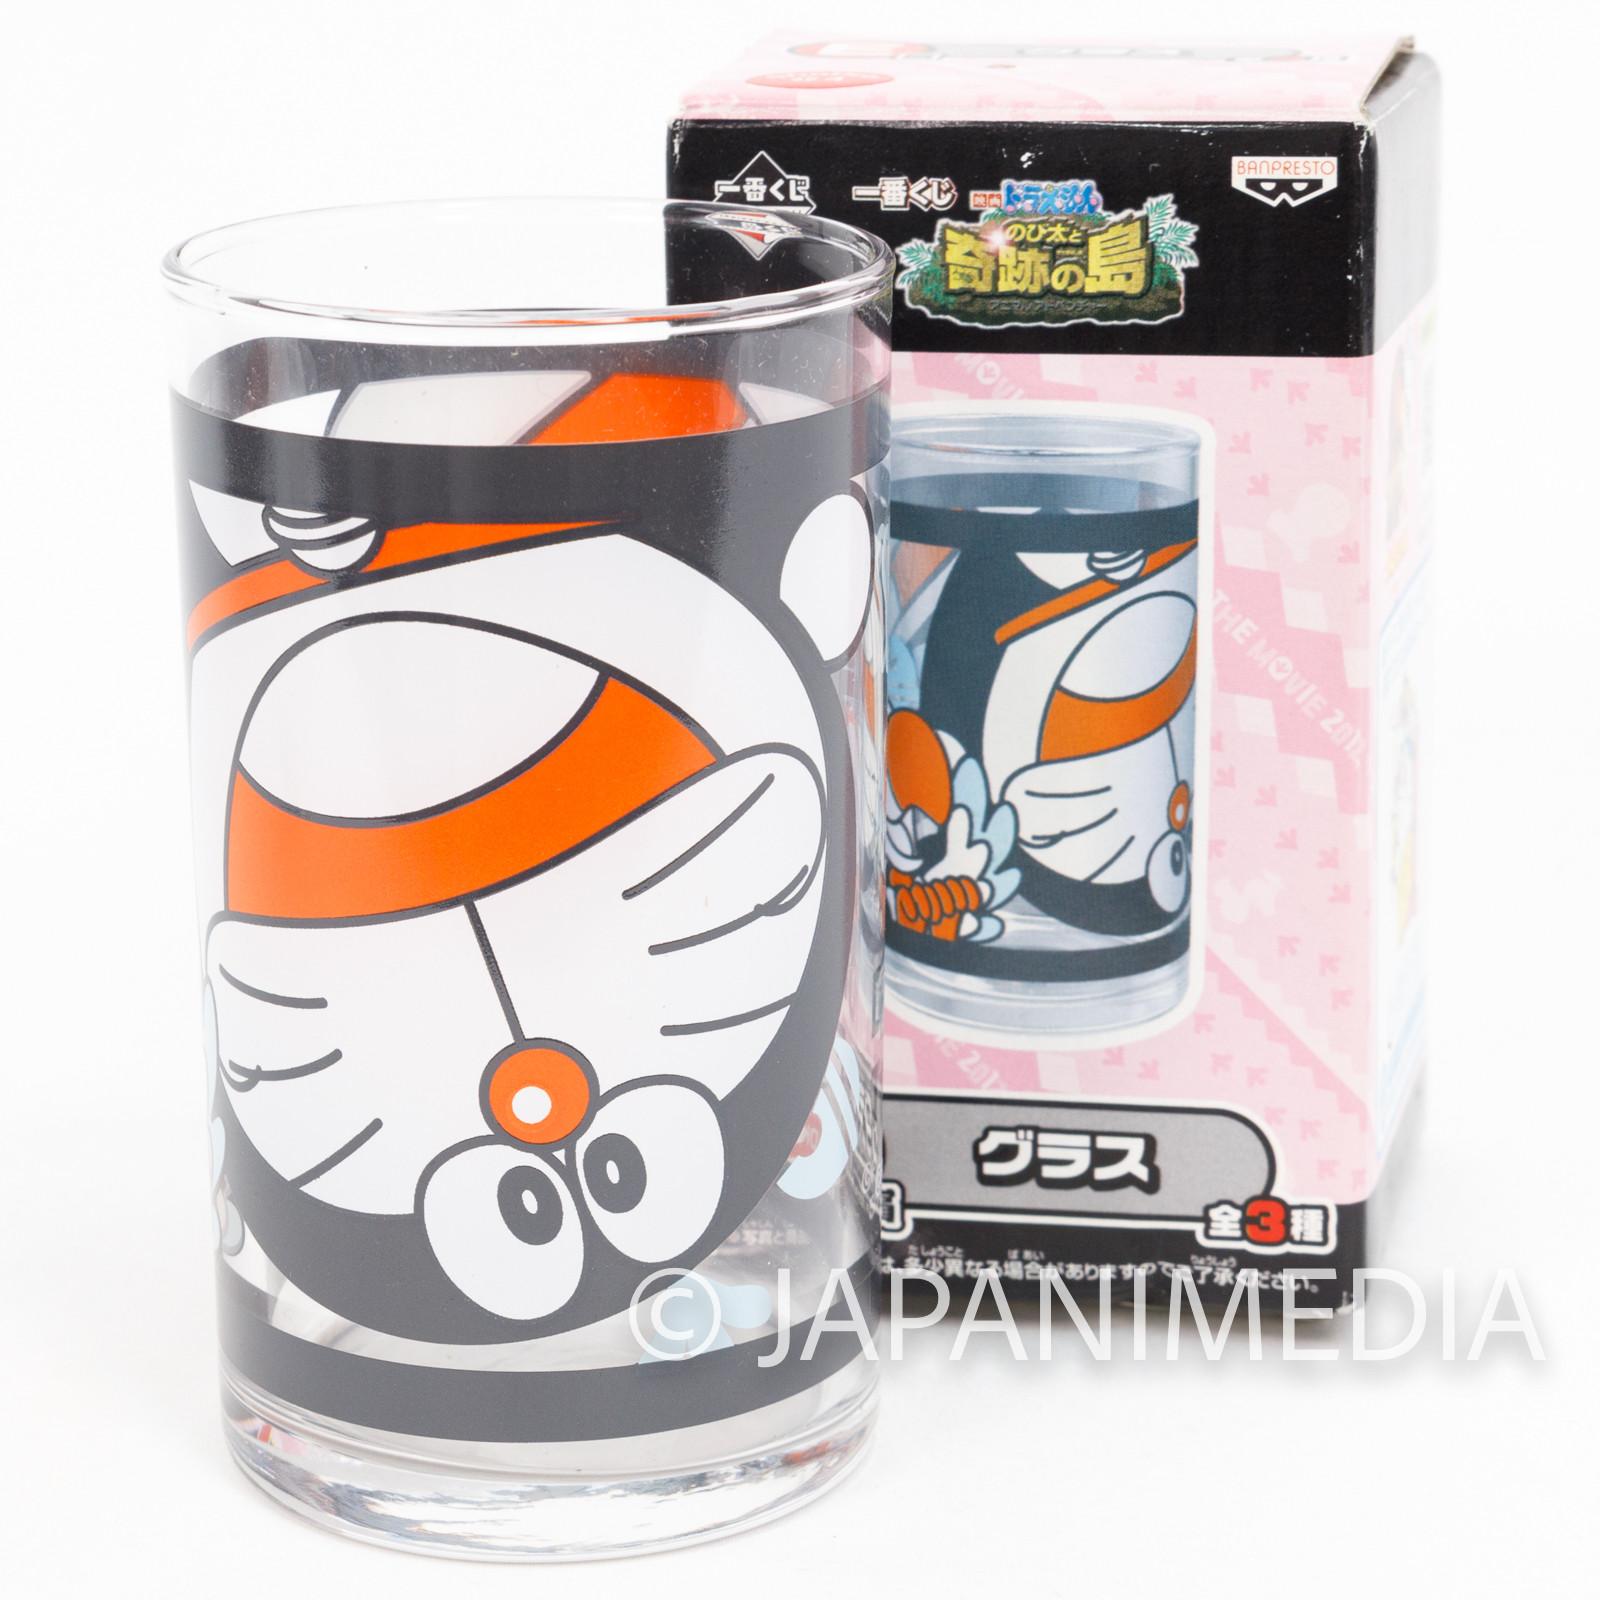 Doraemon The Movie 2012 Visual Art Glass Banpresto JAPAN ANIME MANGA FUJIO